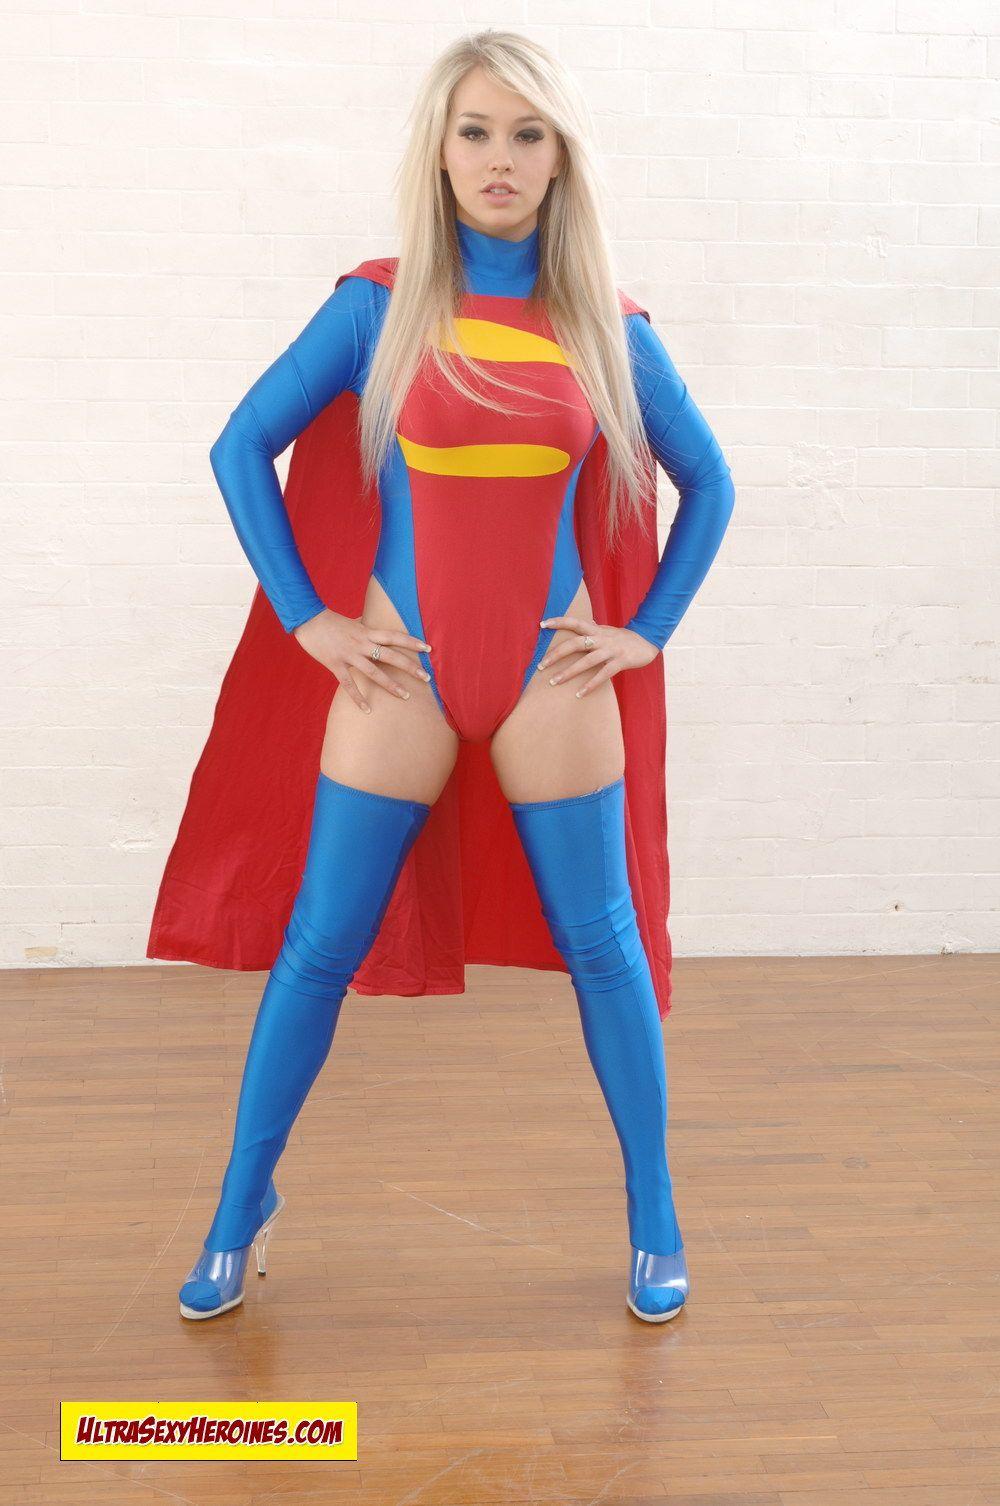 Female Superhero Hentai throughout ultrasexyheroines] sexy teenage super heroine cosplay nude